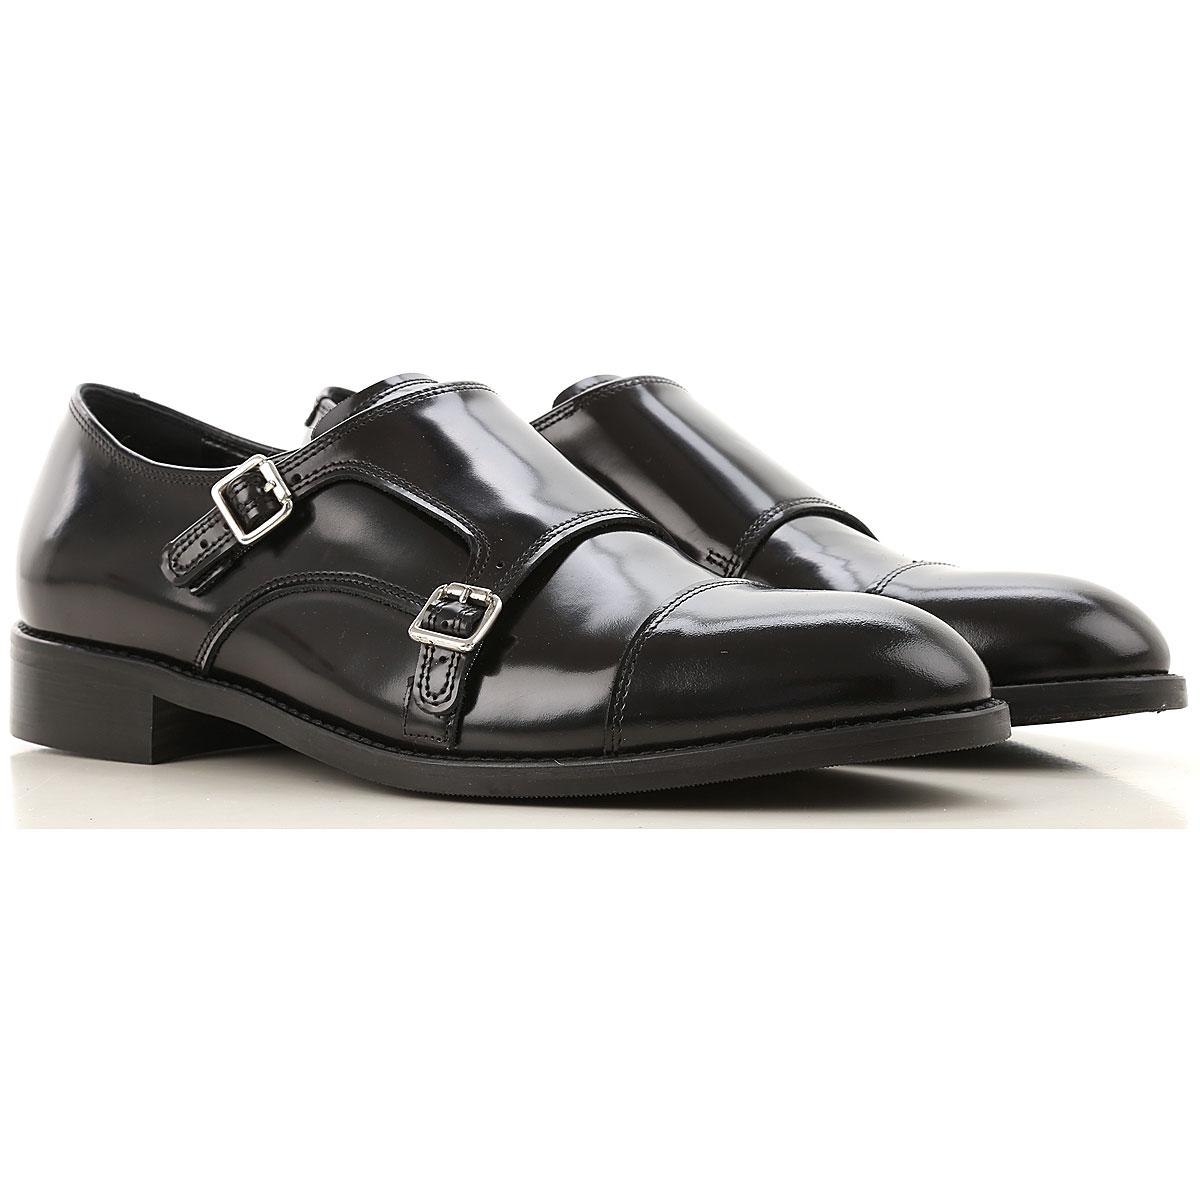 Guglielmo Rotta Womens Shoes On Sale, Black, Leather, 2019, 7 8 9